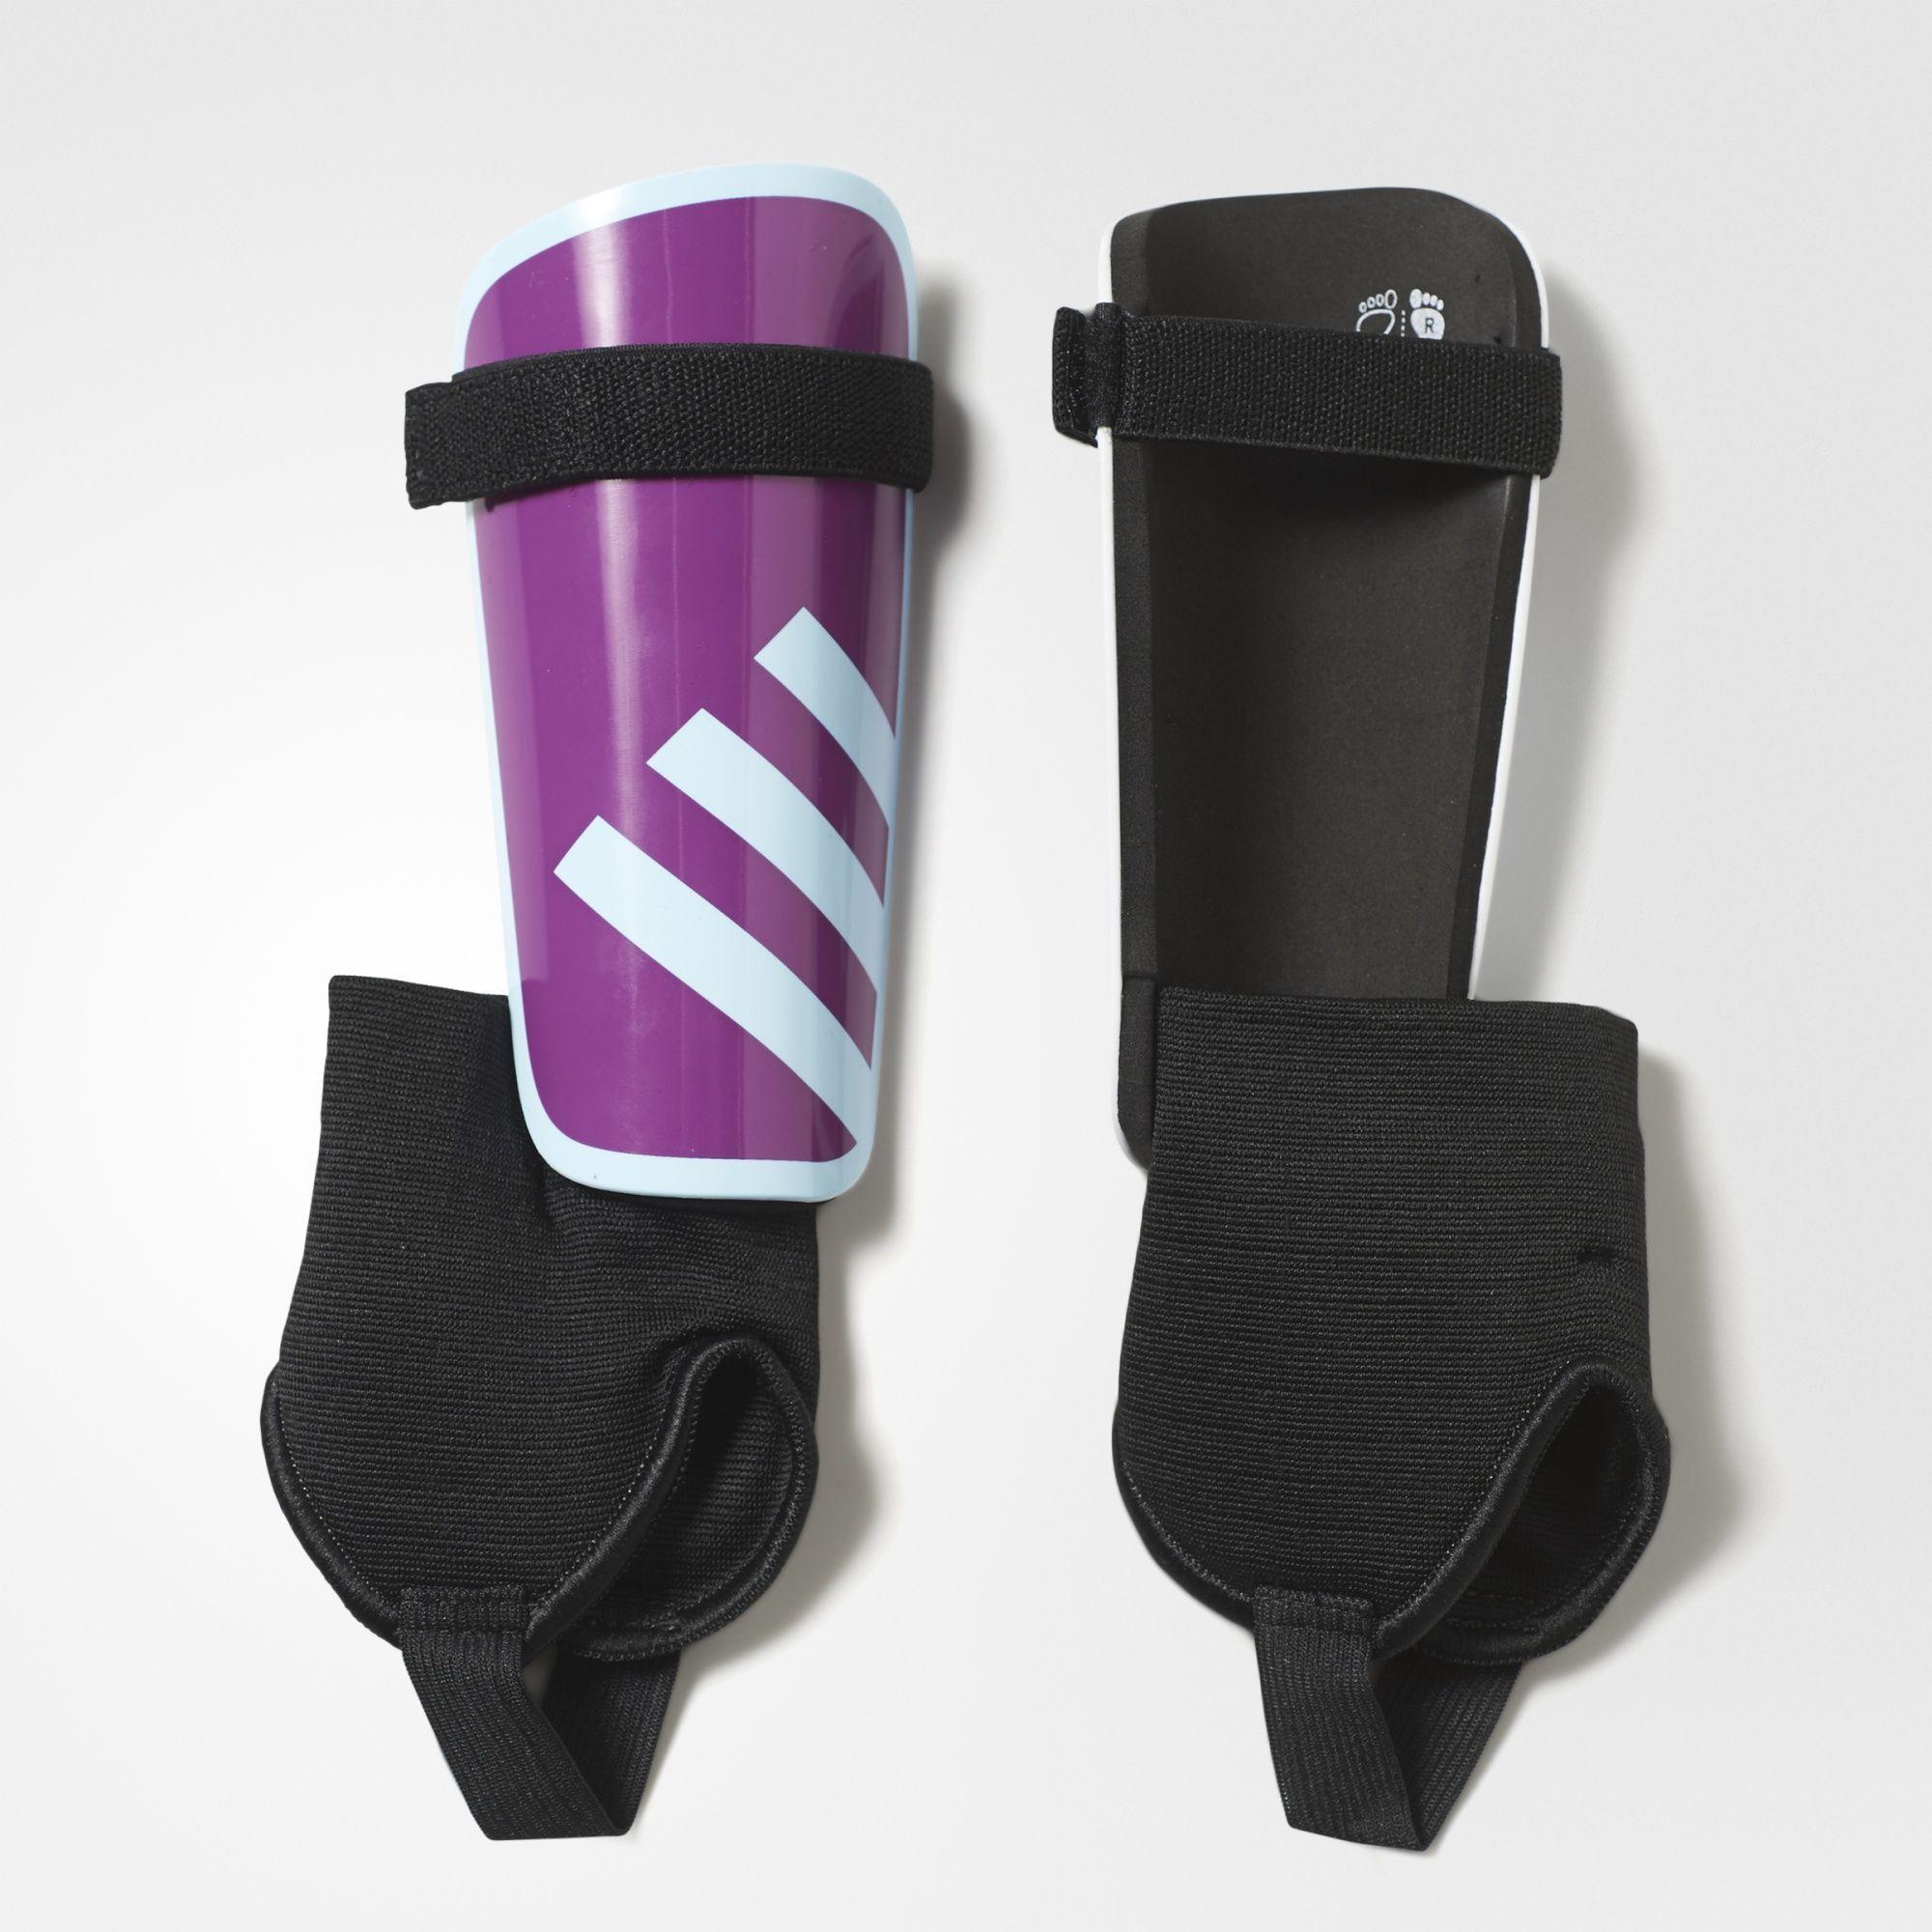 hot products skate shoes meet adidas - Ghost Schienbeinschoner | Leo | Pinterest | Adidas ...